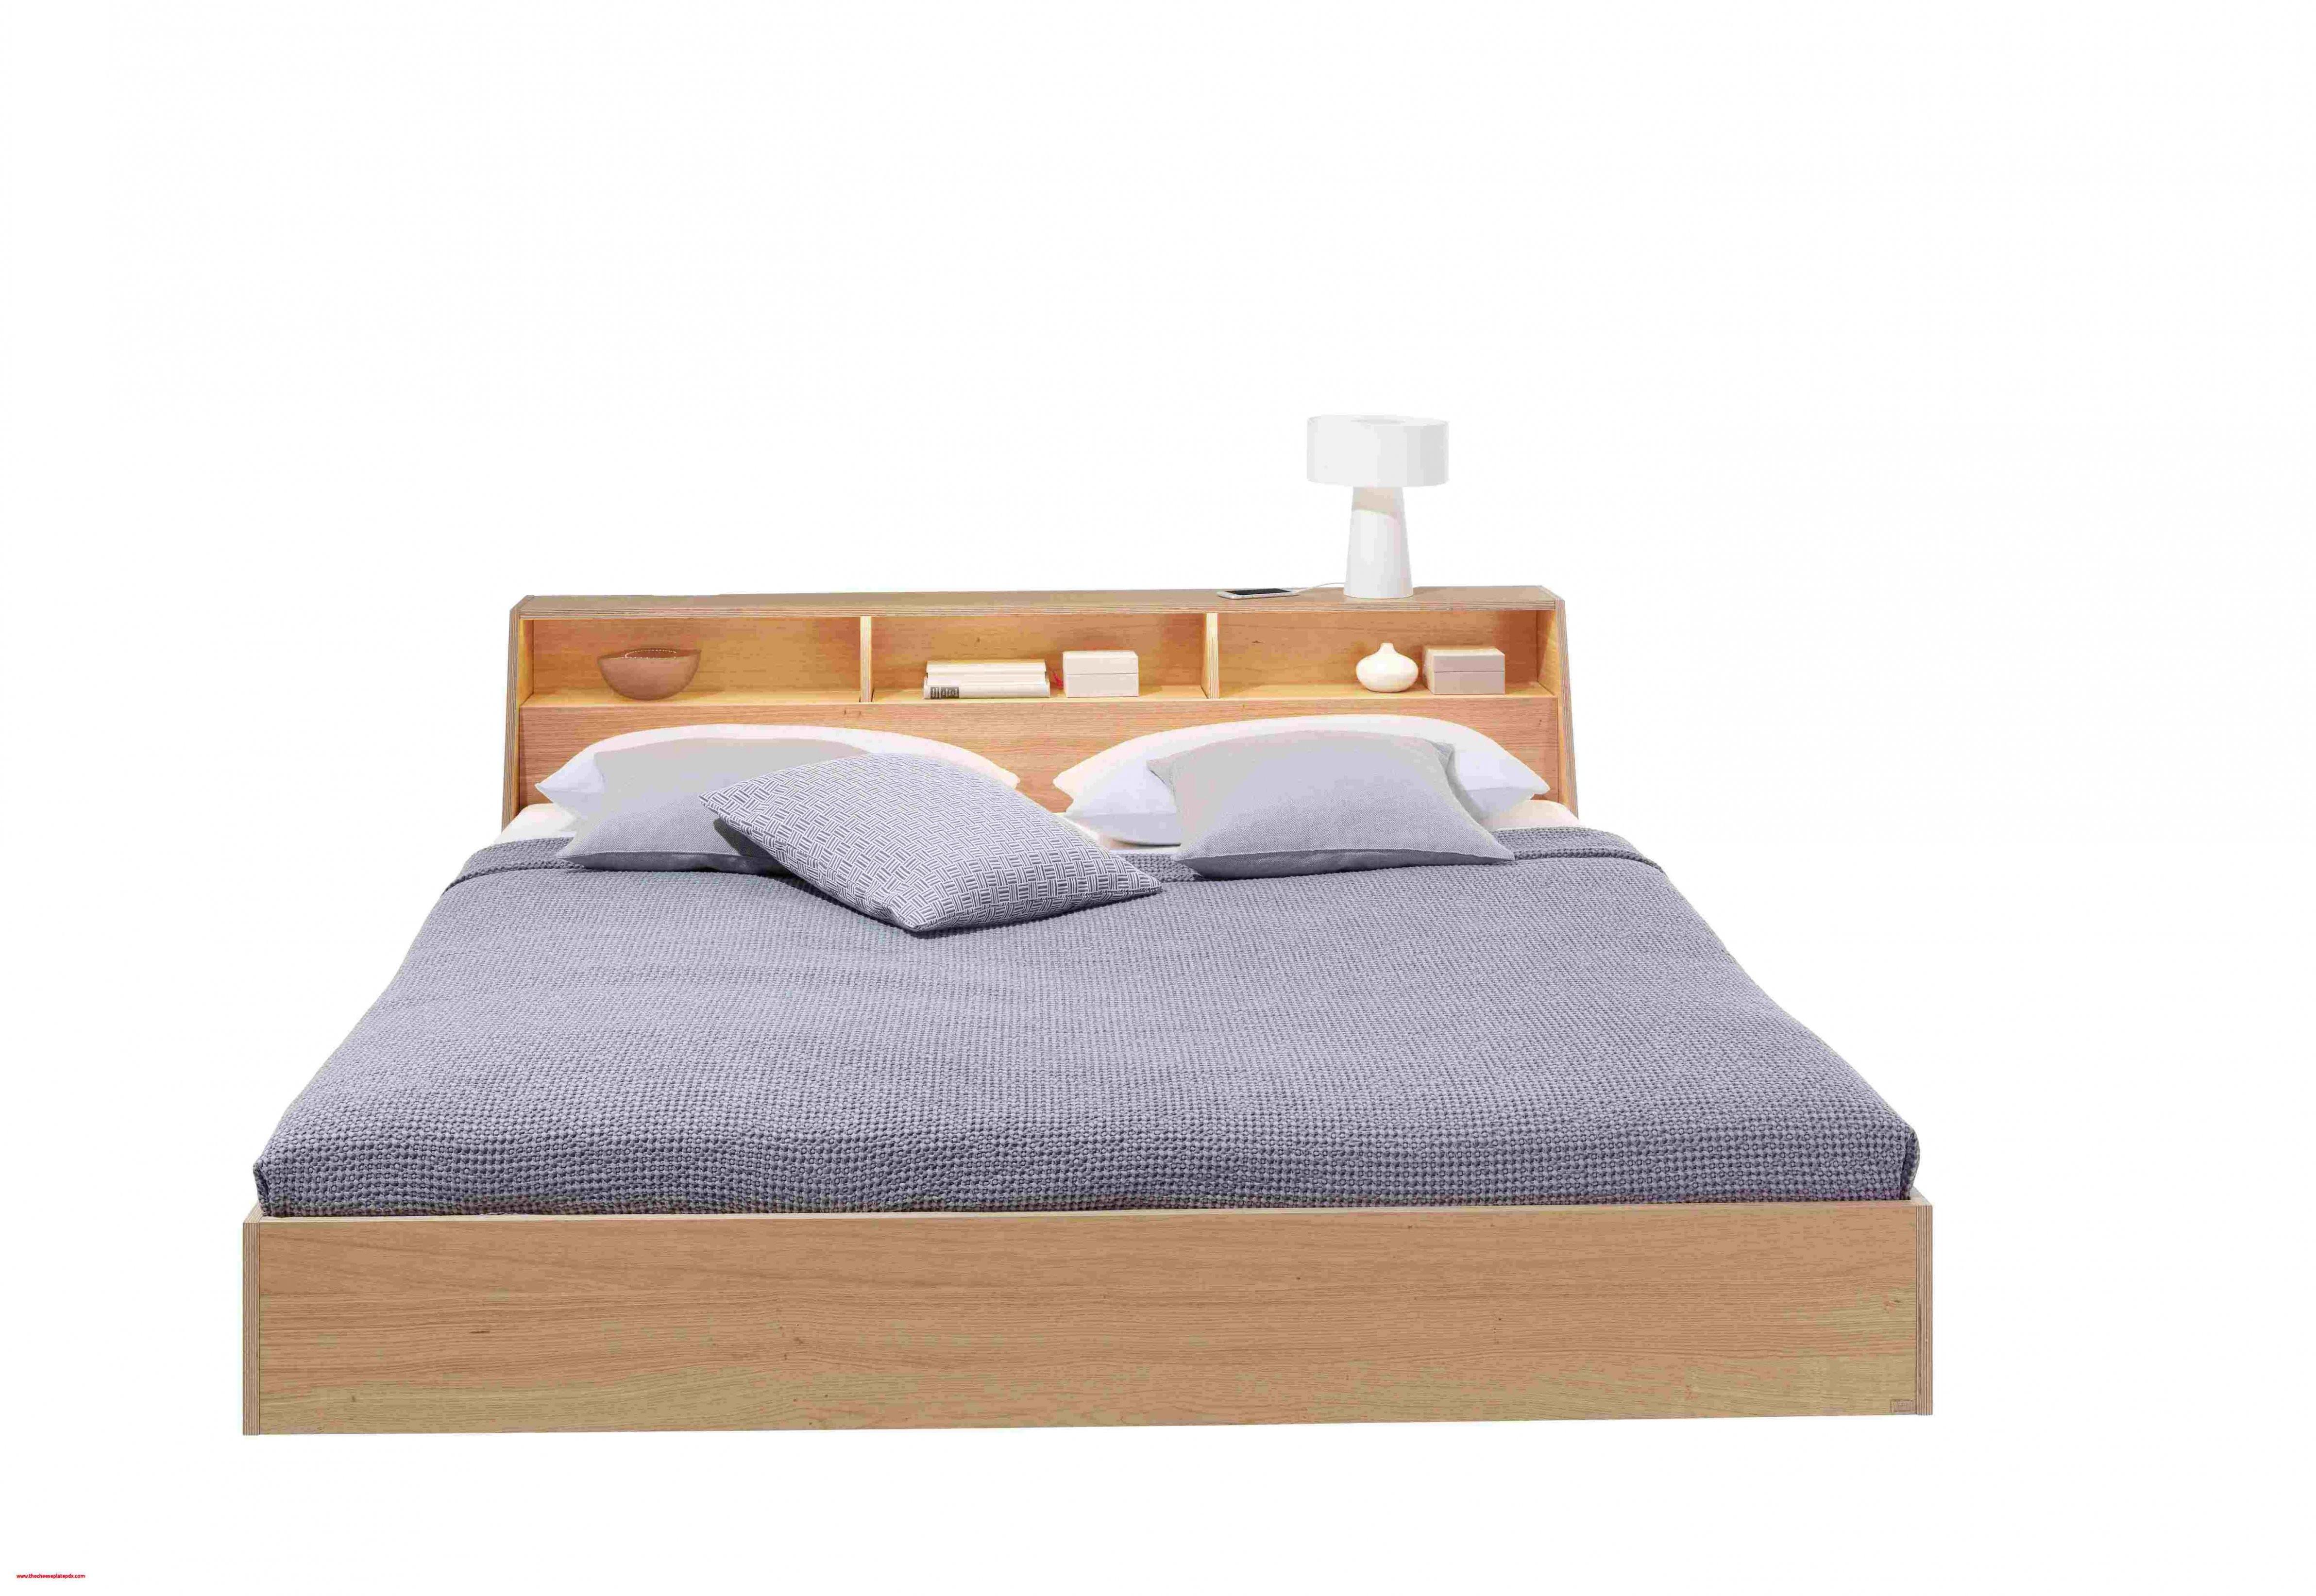 It's Bett 120X200 Ikea To von Komplett Bett 120X200 Bild